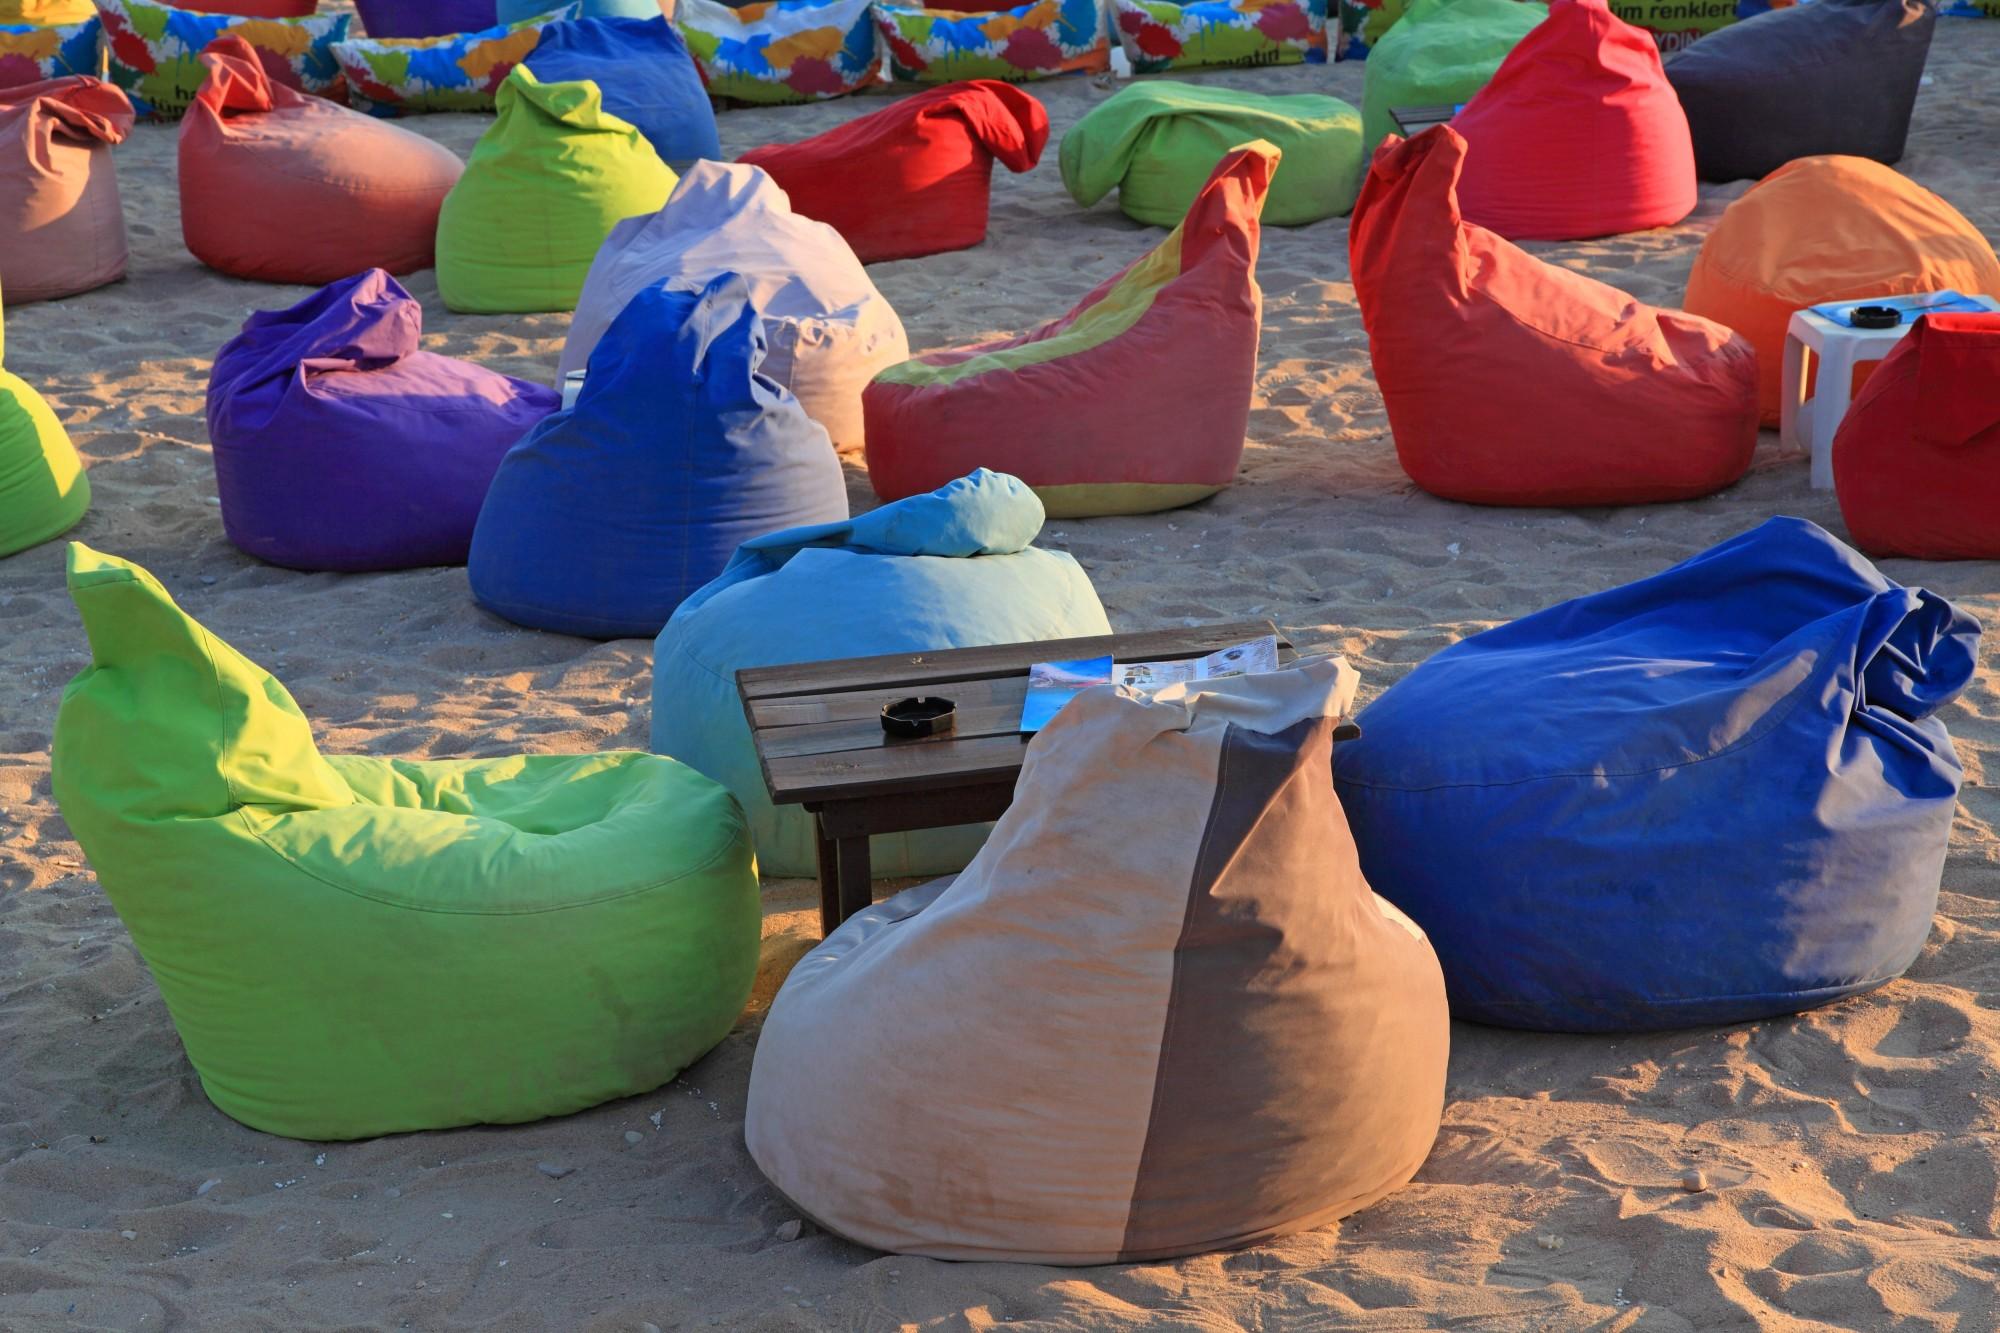 12 Weirdest But Best Bean Bag Chairs On The Market And